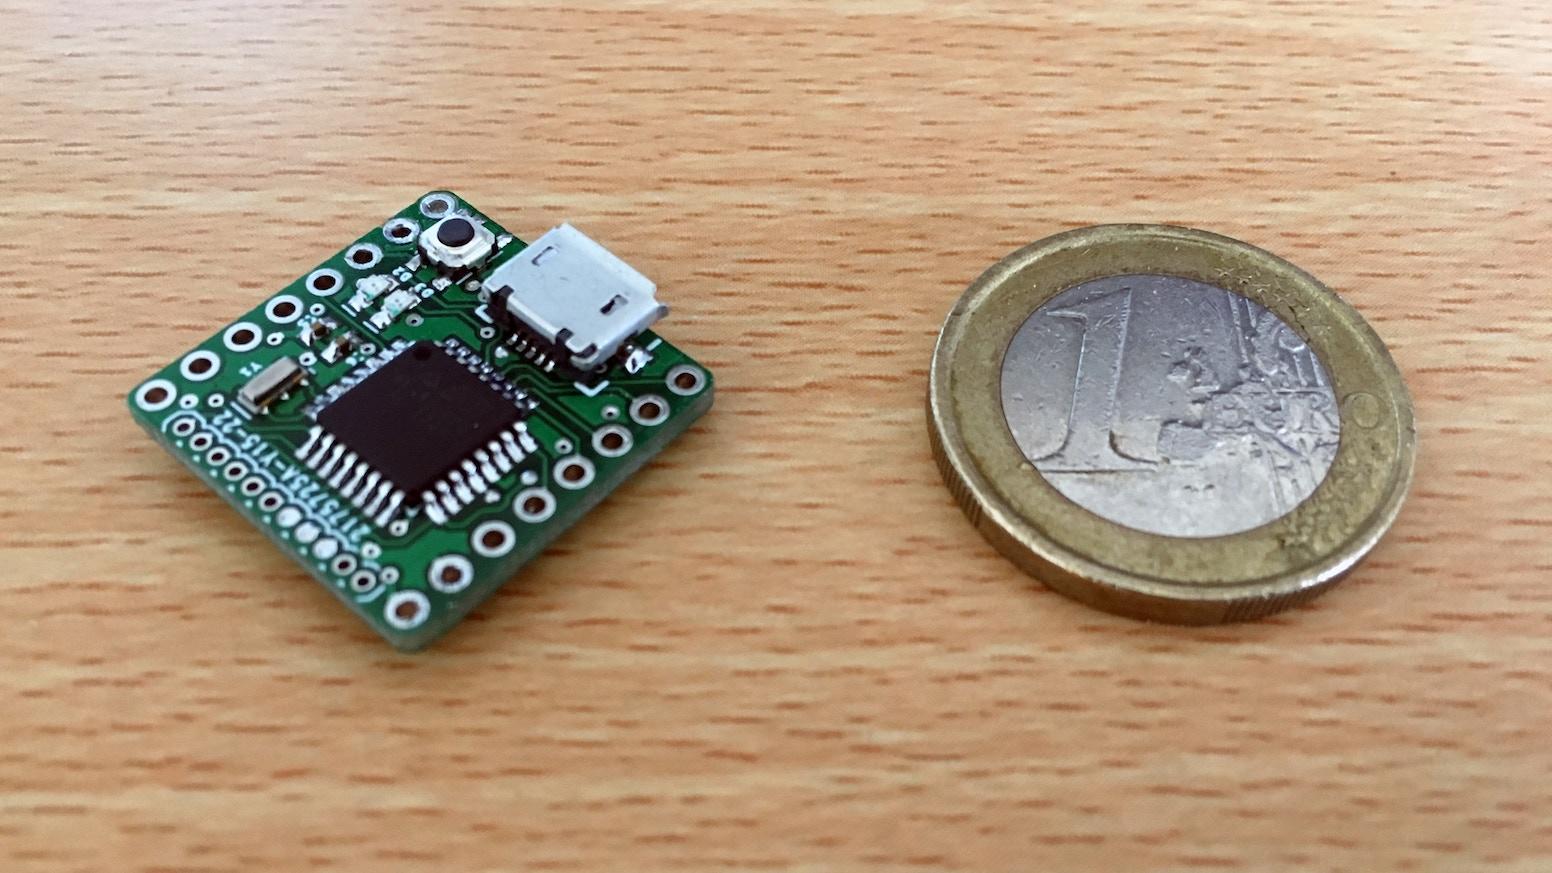 Pico - The World's Smallest Arduino 328PB Core  by BitsNBlobs